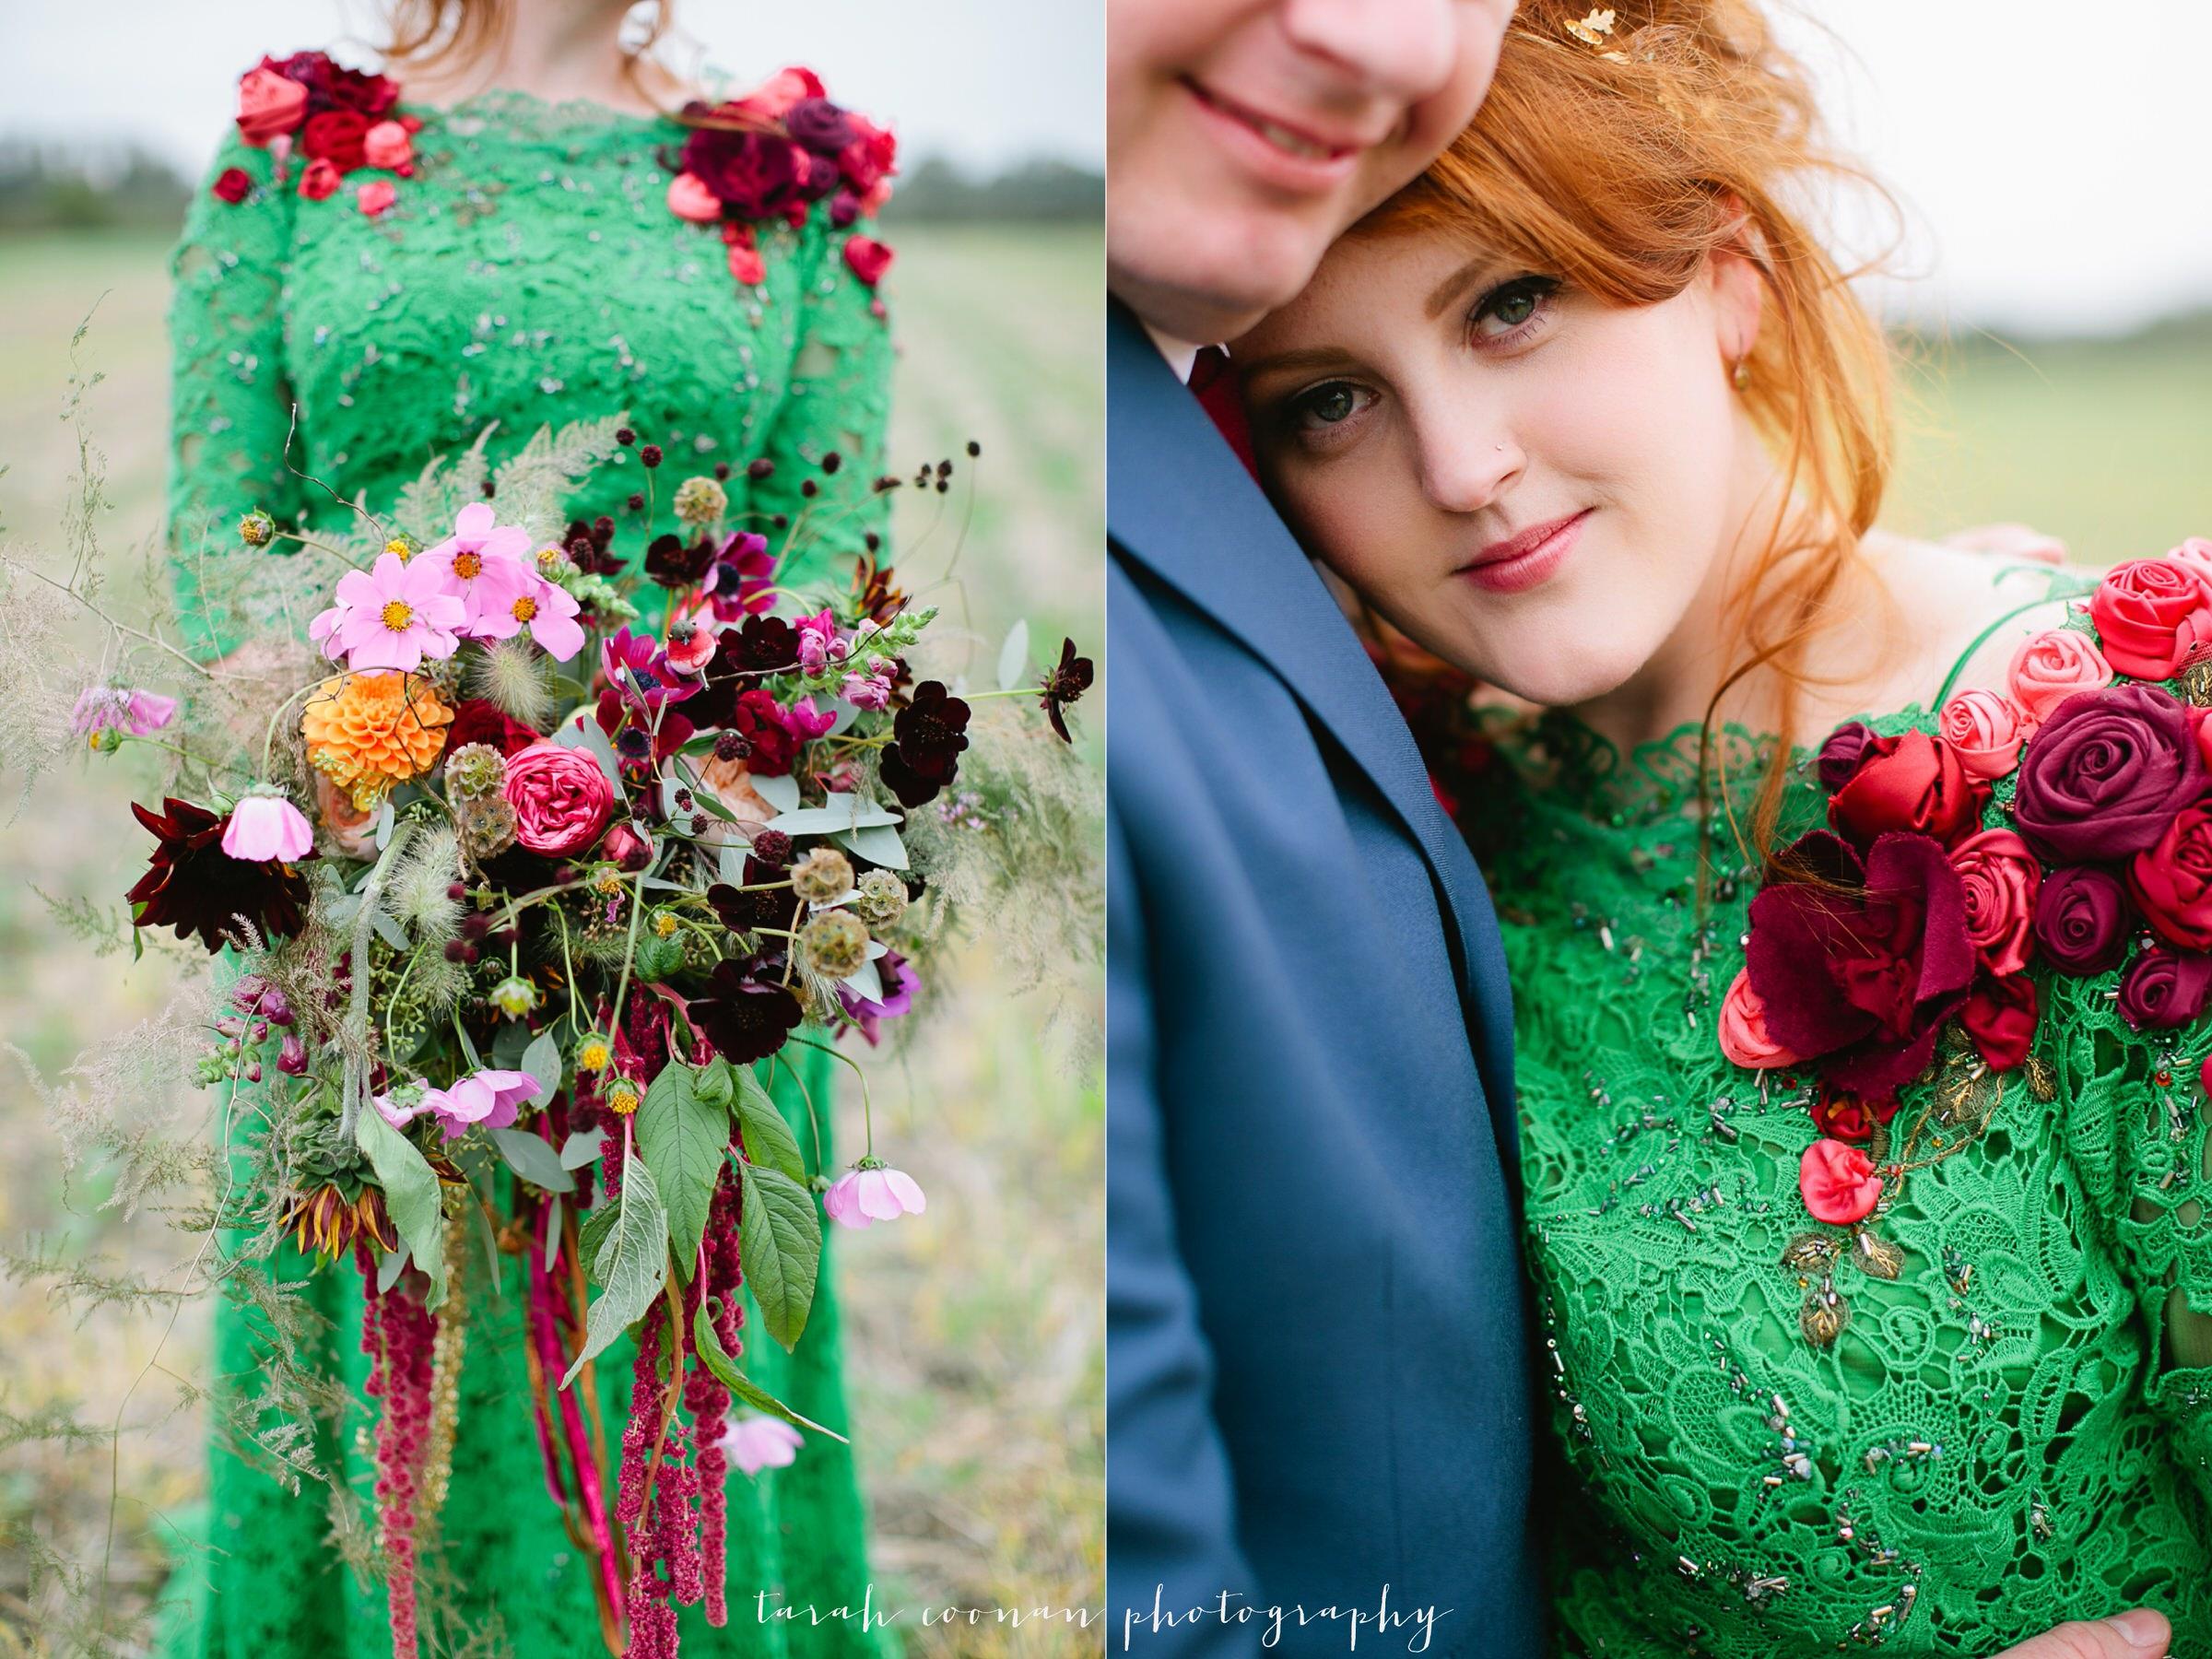 brighton-wedding-photographer61